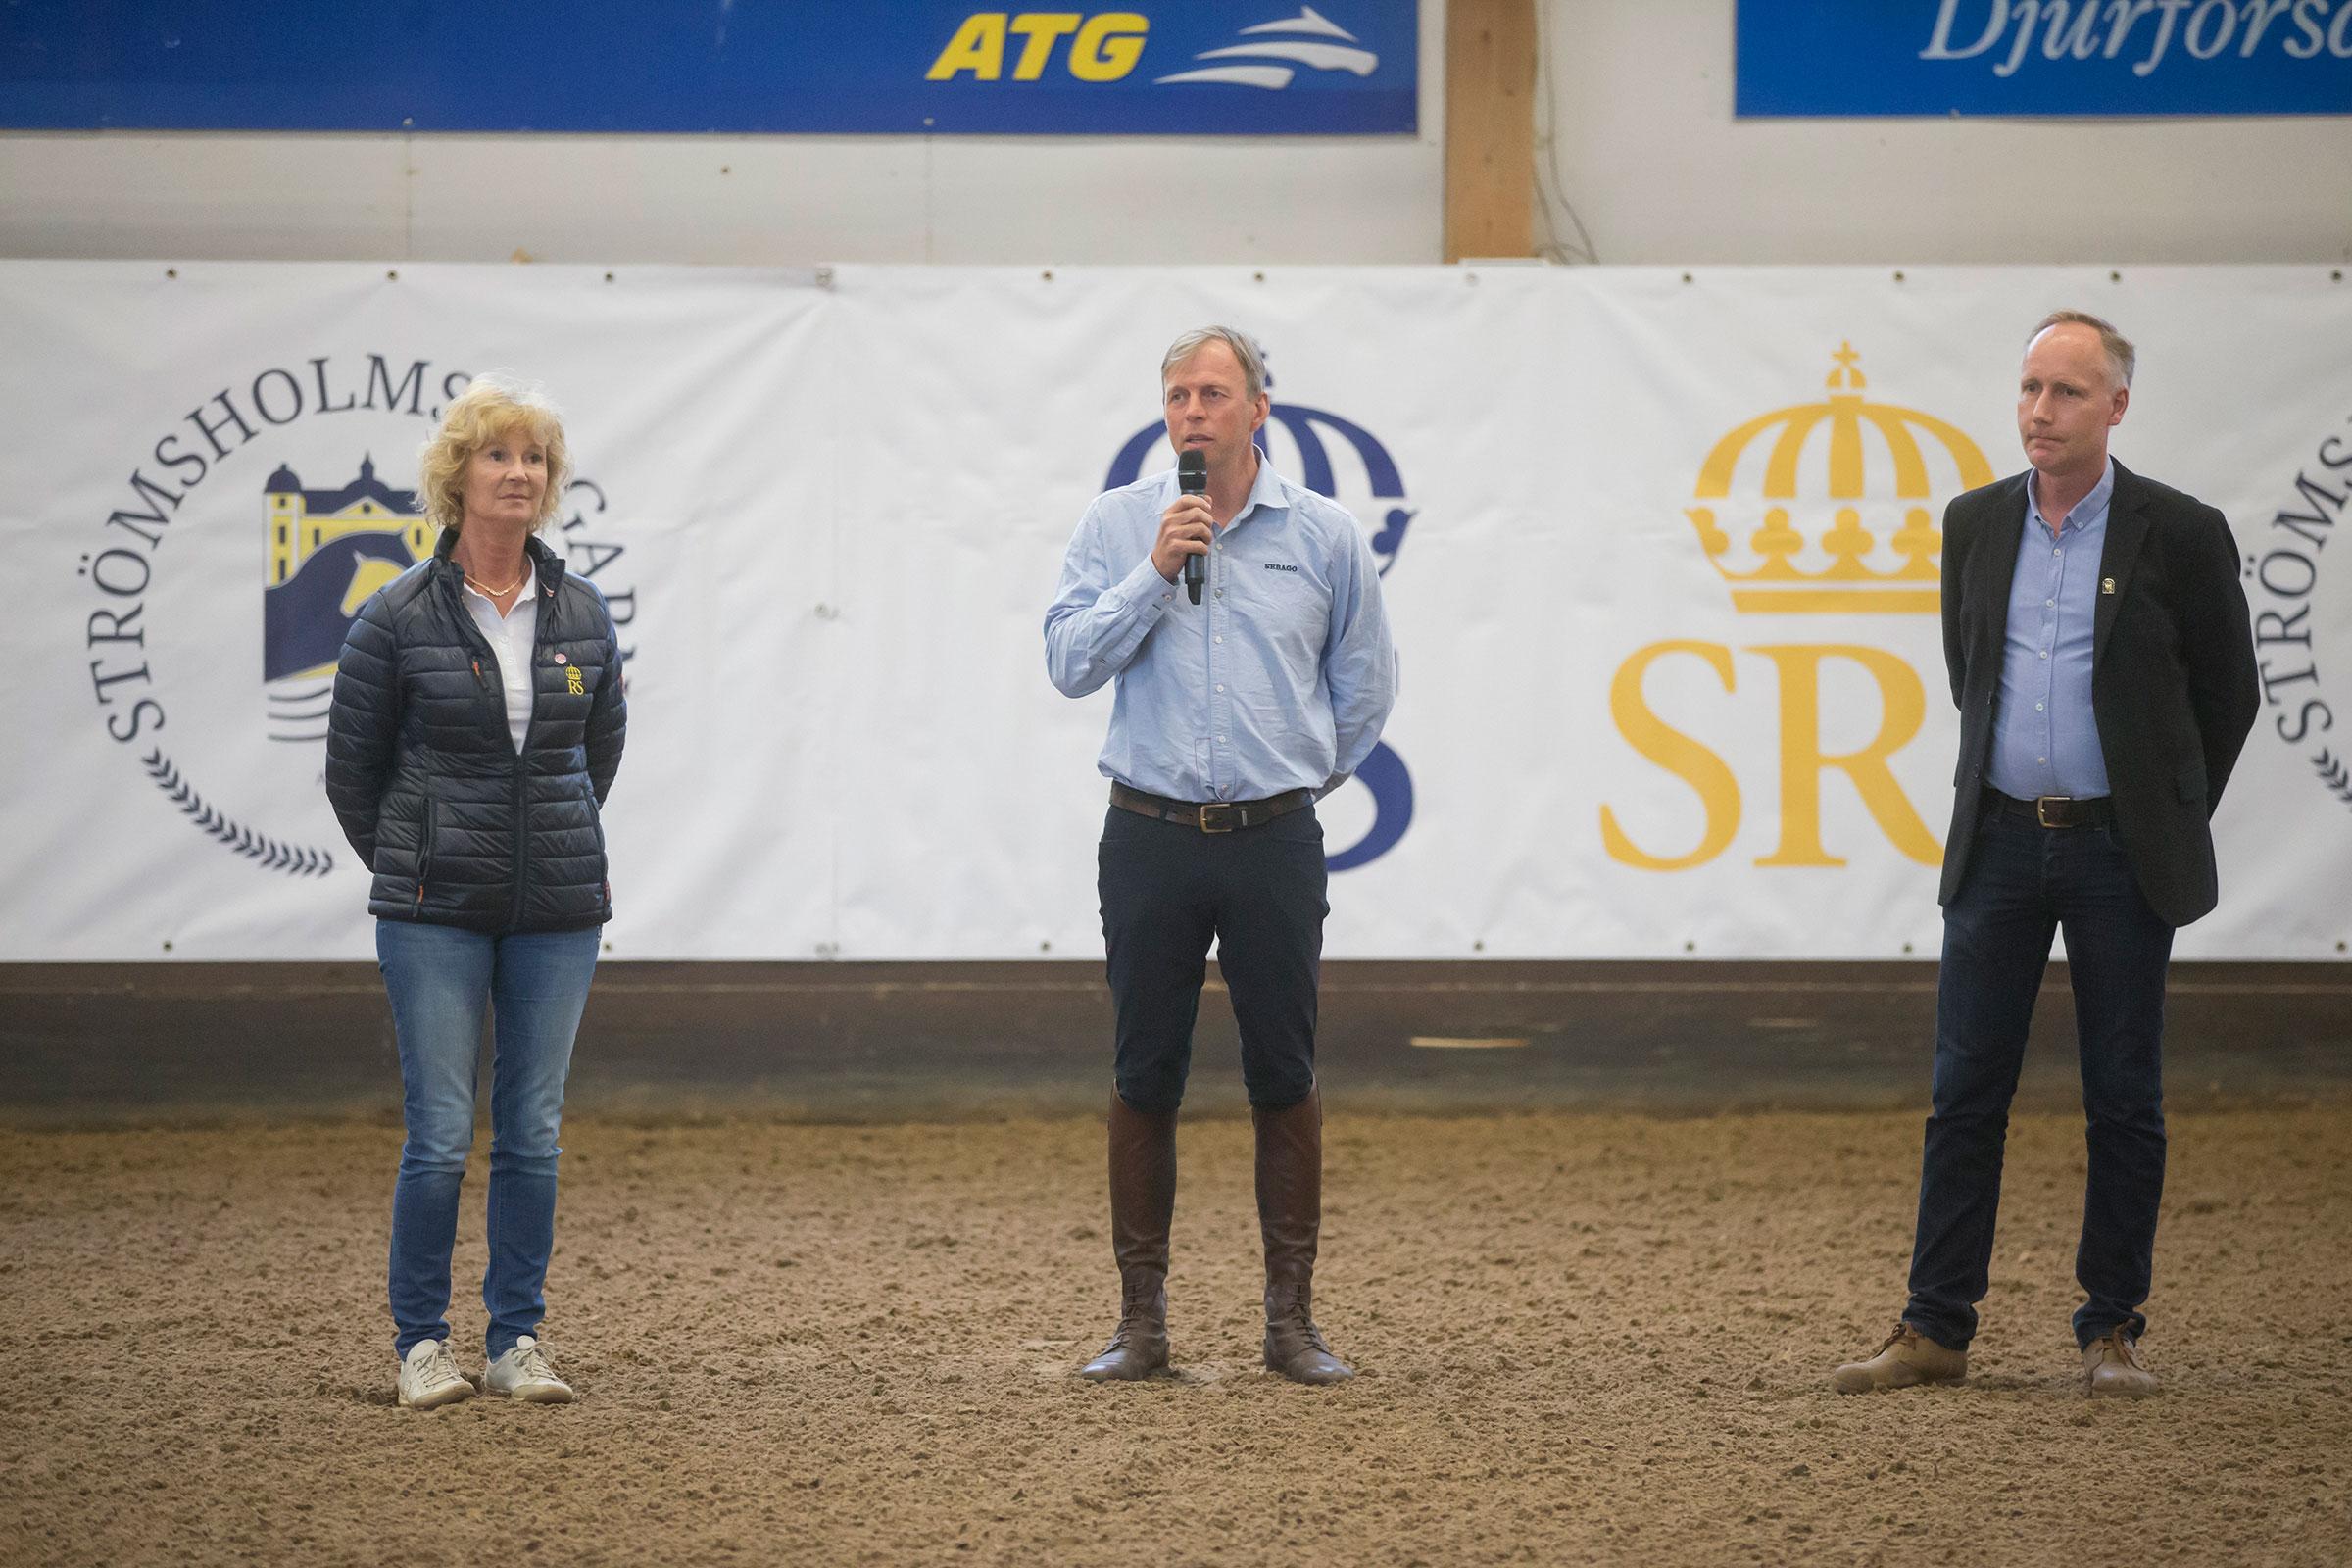 180508 Strömsholm Strömsholmpersonalen presenterade dressyr-clinicen, Marianne Essén, Jens Fredricson och Jonas Johnsson. Photo: Roland Thunholm Code: 718 35